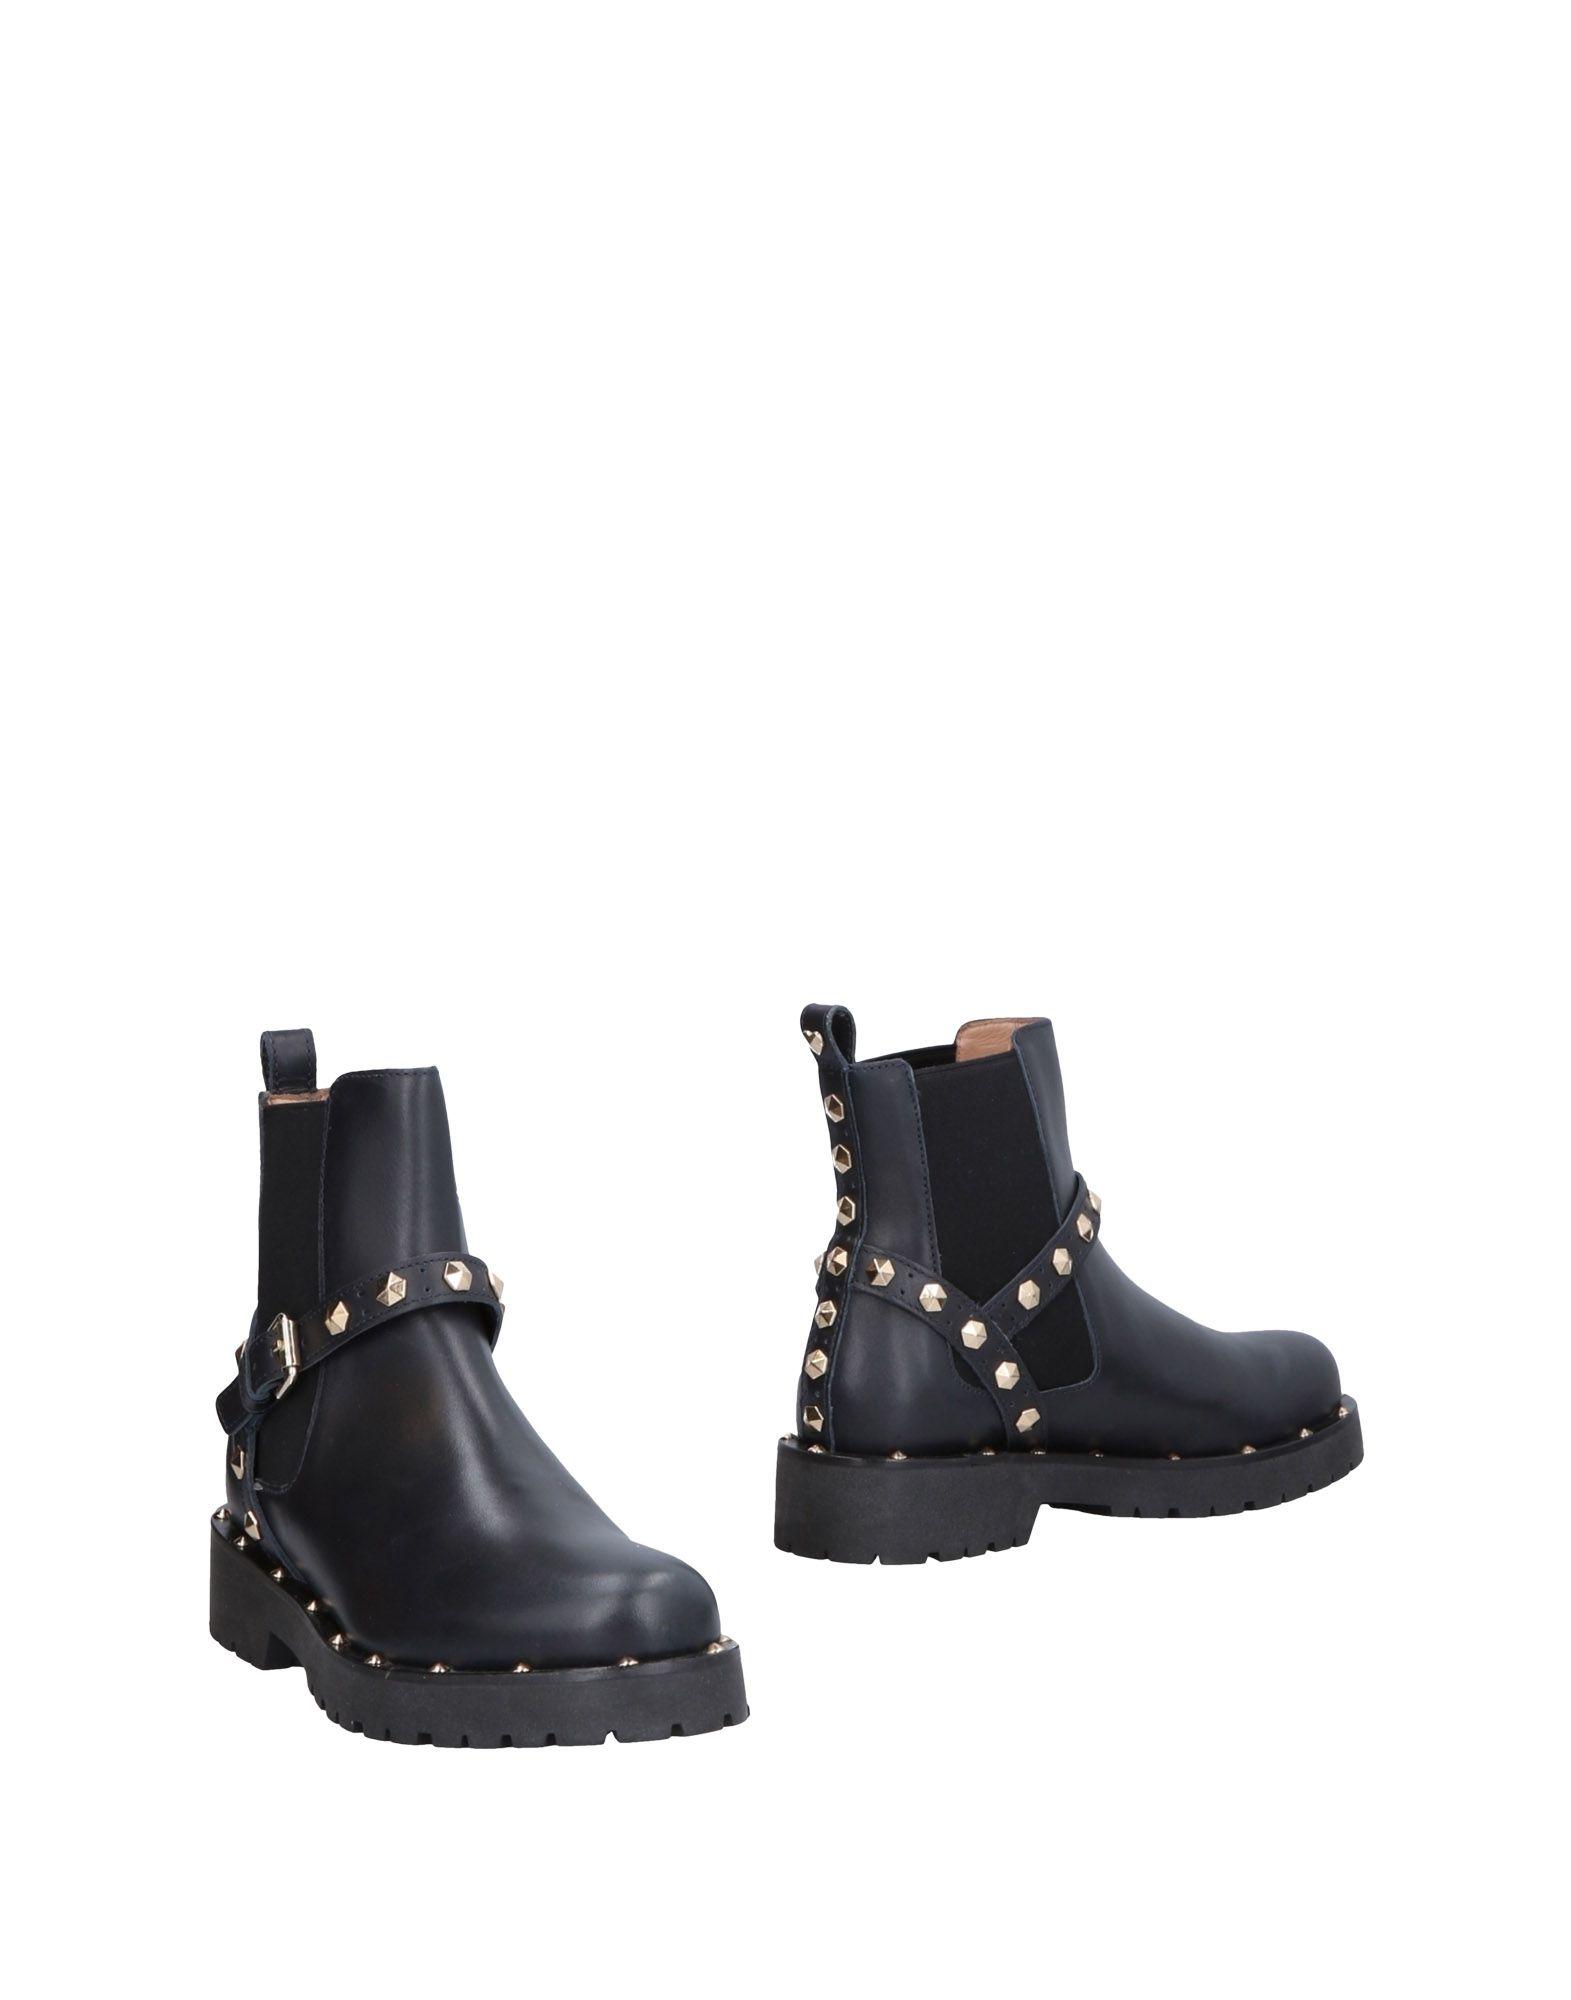 Haltbare Mode billige Schuhe Schuhe Twin 11462280TD Beliebte Schuhe billige af1641